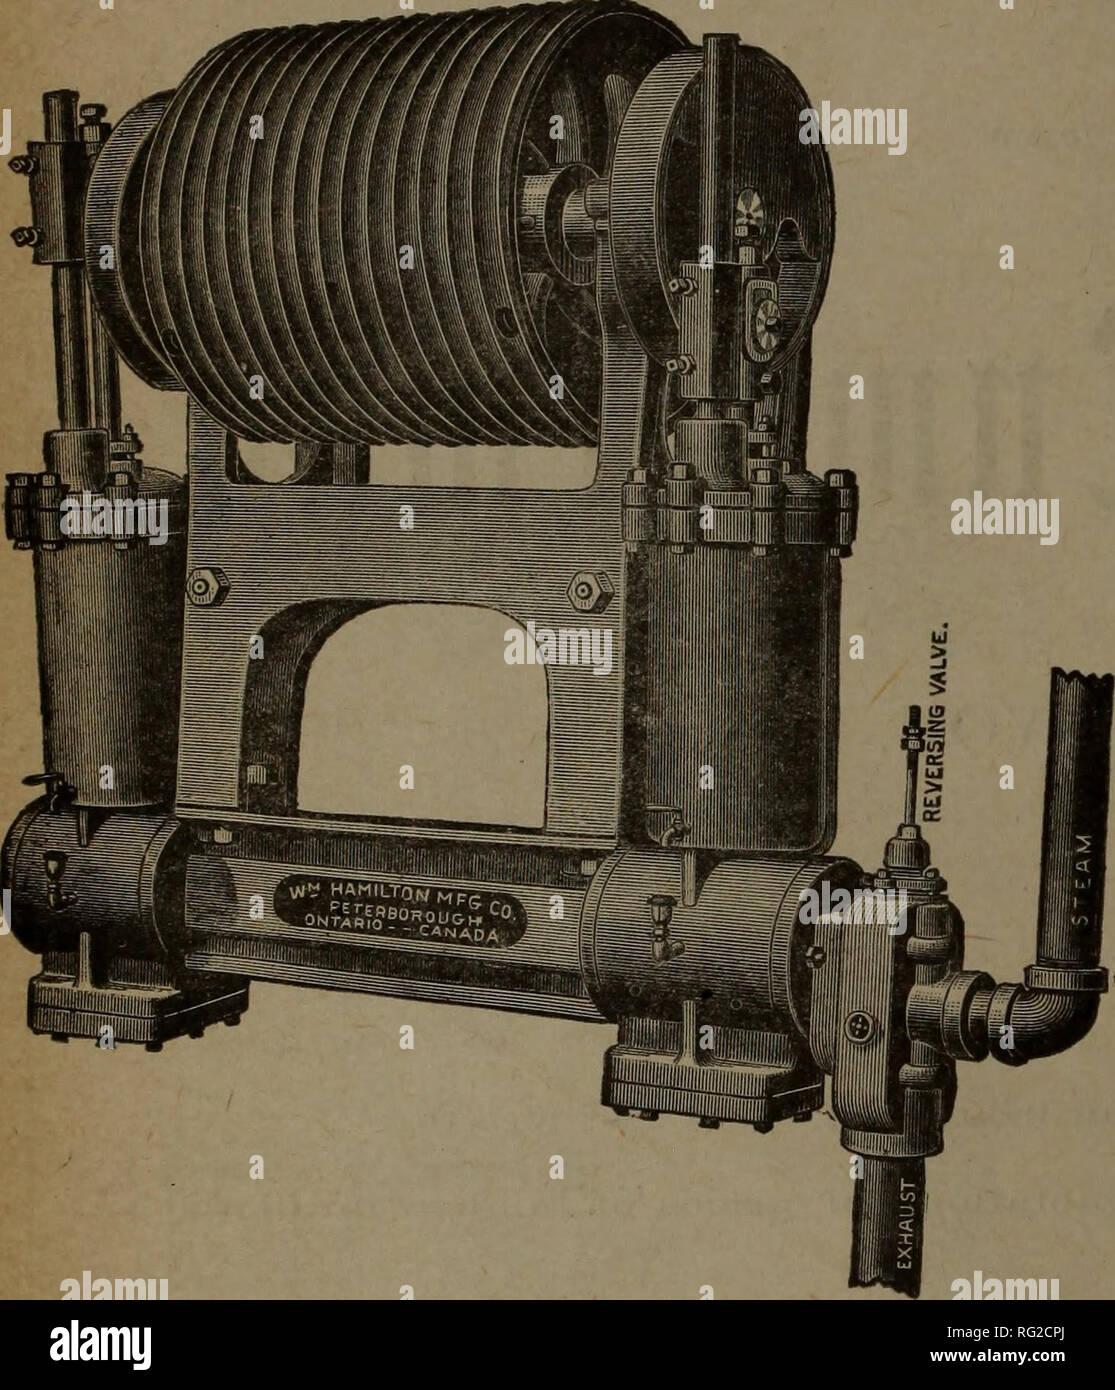 1885 Wood Engraving Stock Photos & 1885 Wood Engraving Stock